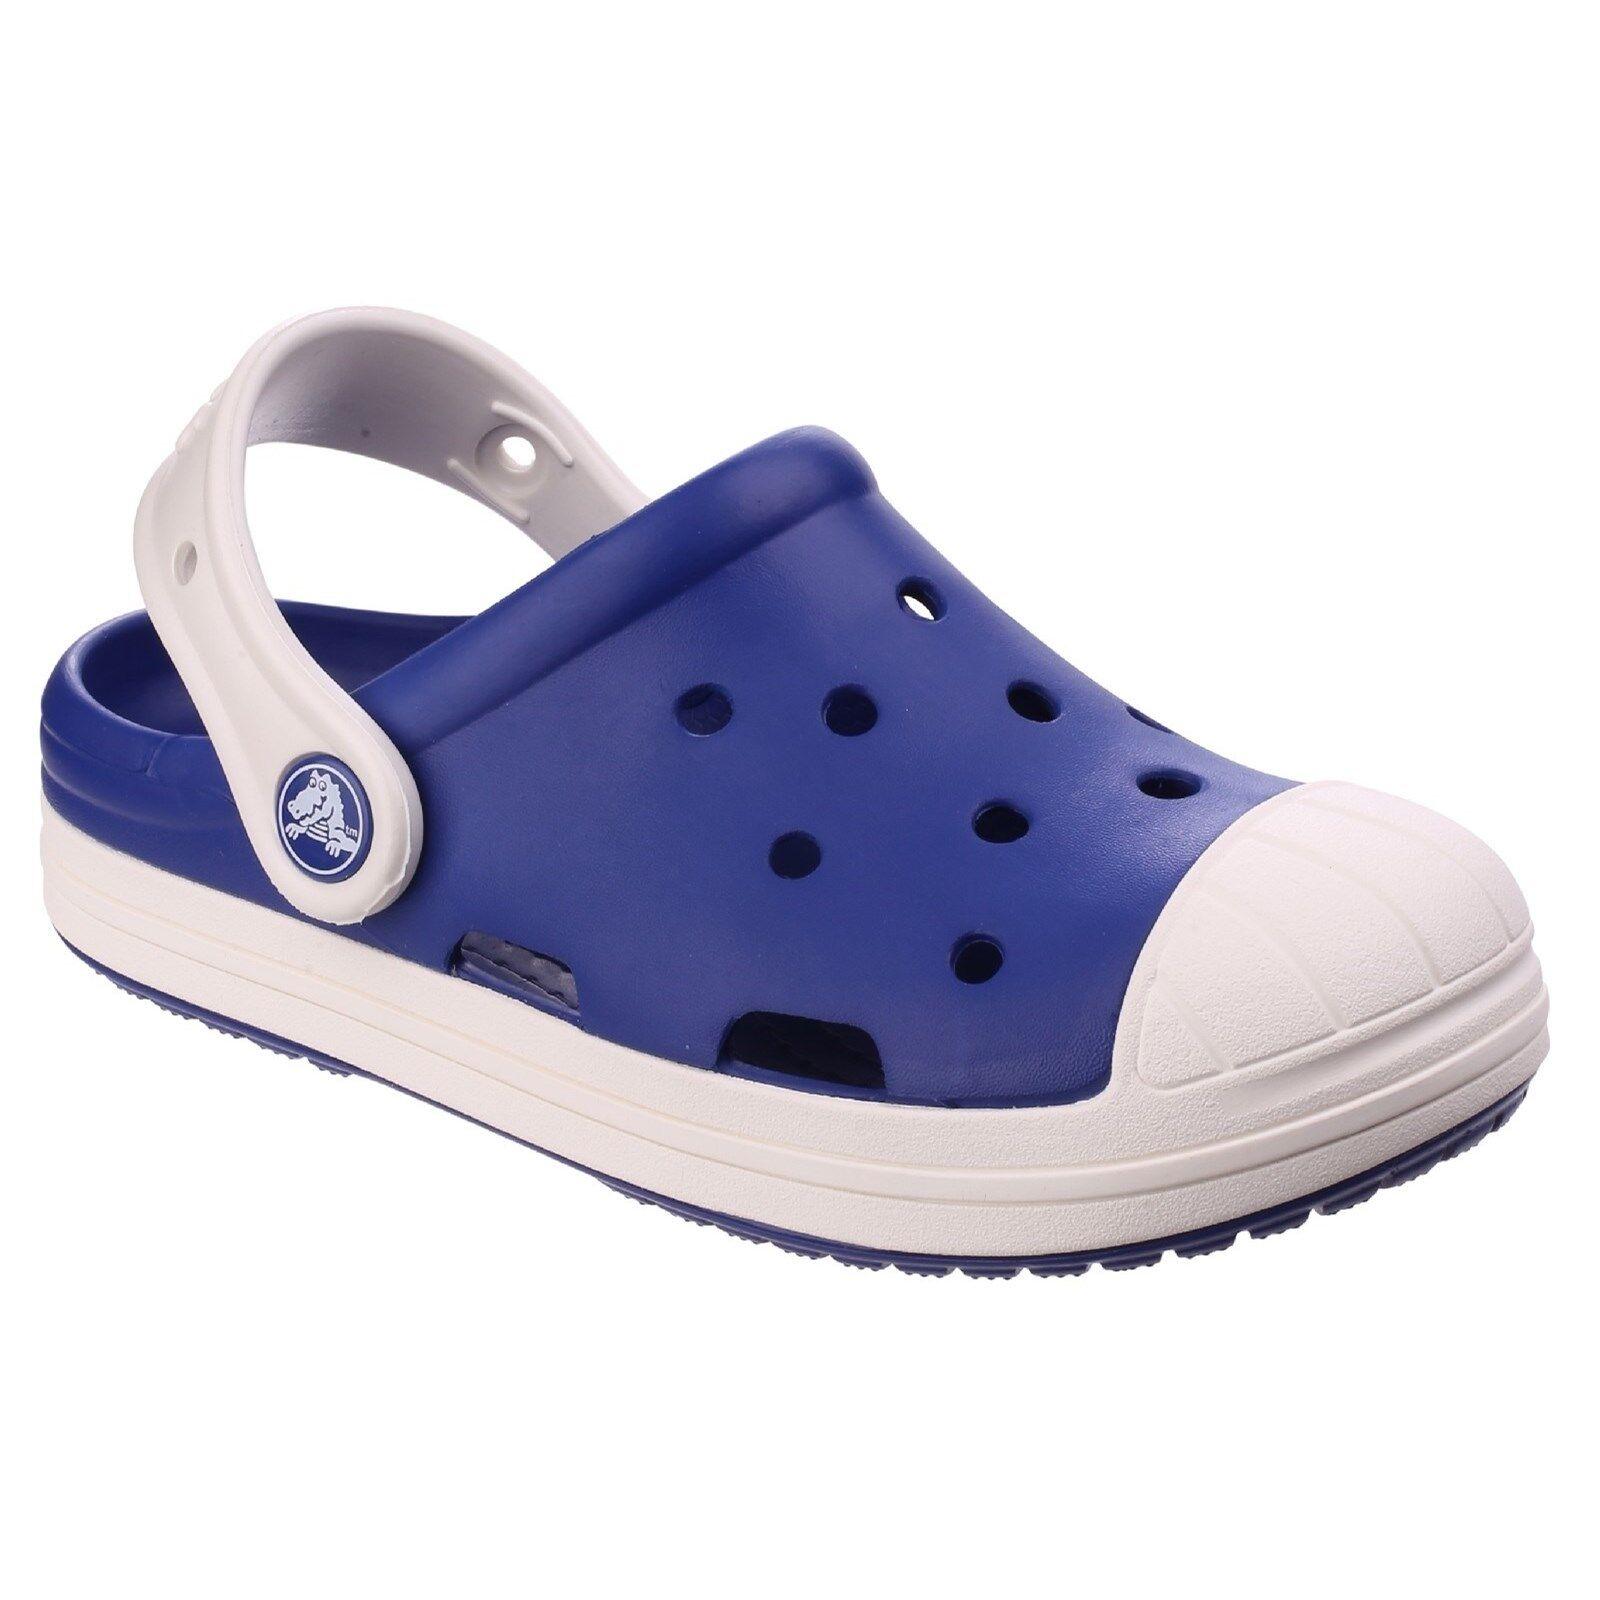 42a78d8917f1 Details about Crocs Bump It Clogs Childrens Croslite Lightweight Kids Boys  Girls Shoes Sandals